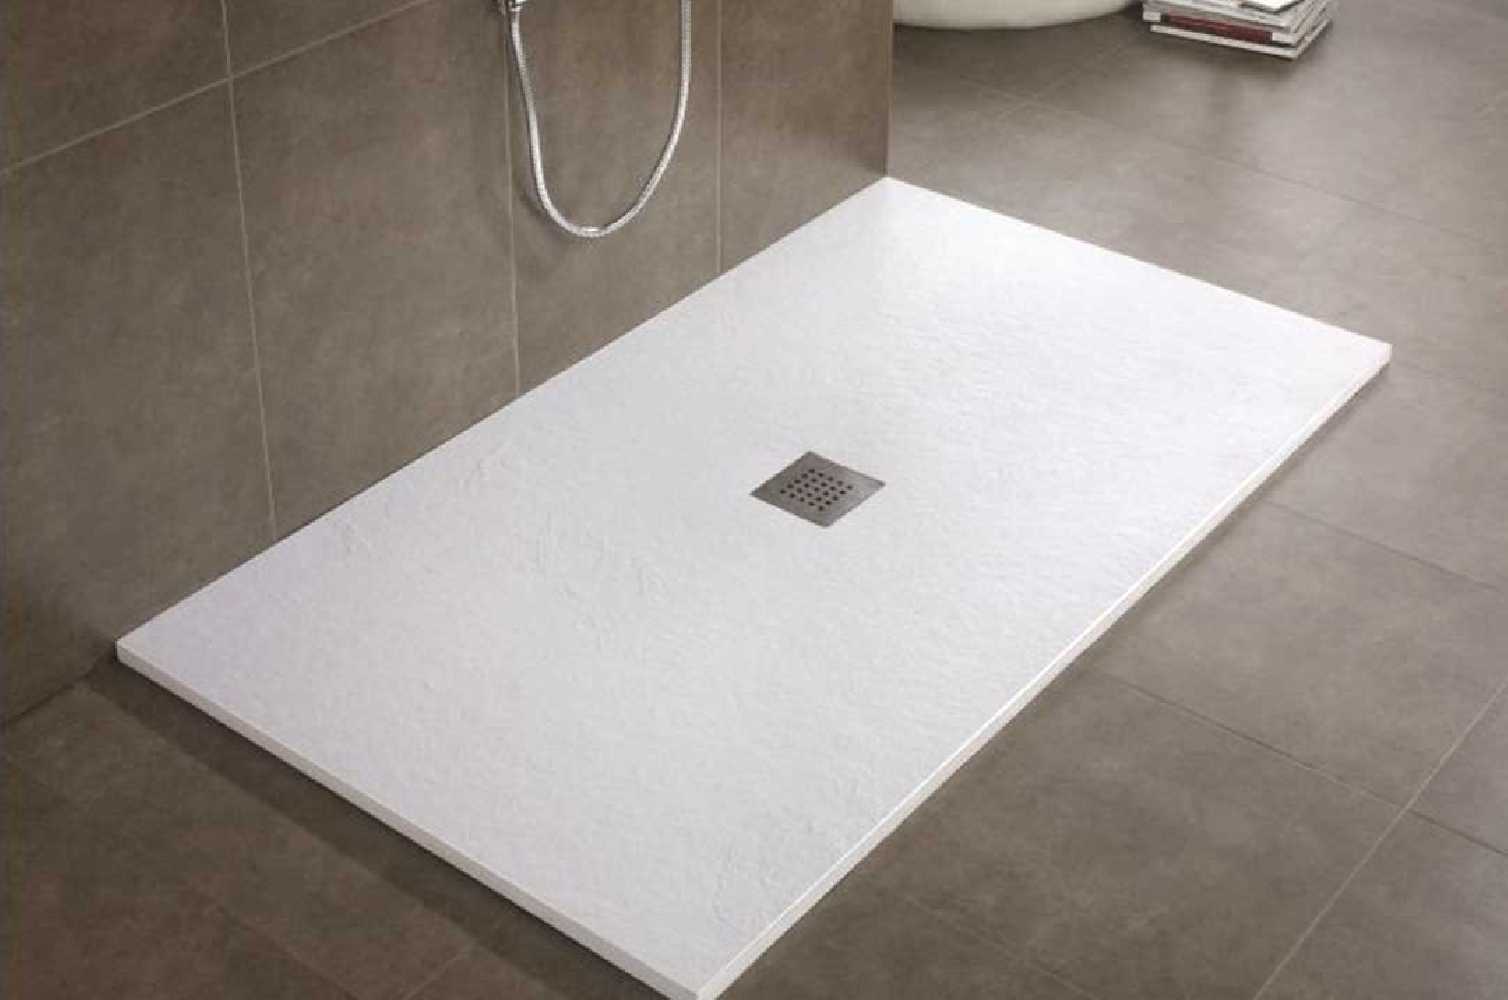 receveur de douche r sigr s de 100x100 100x200. Black Bedroom Furniture Sets. Home Design Ideas